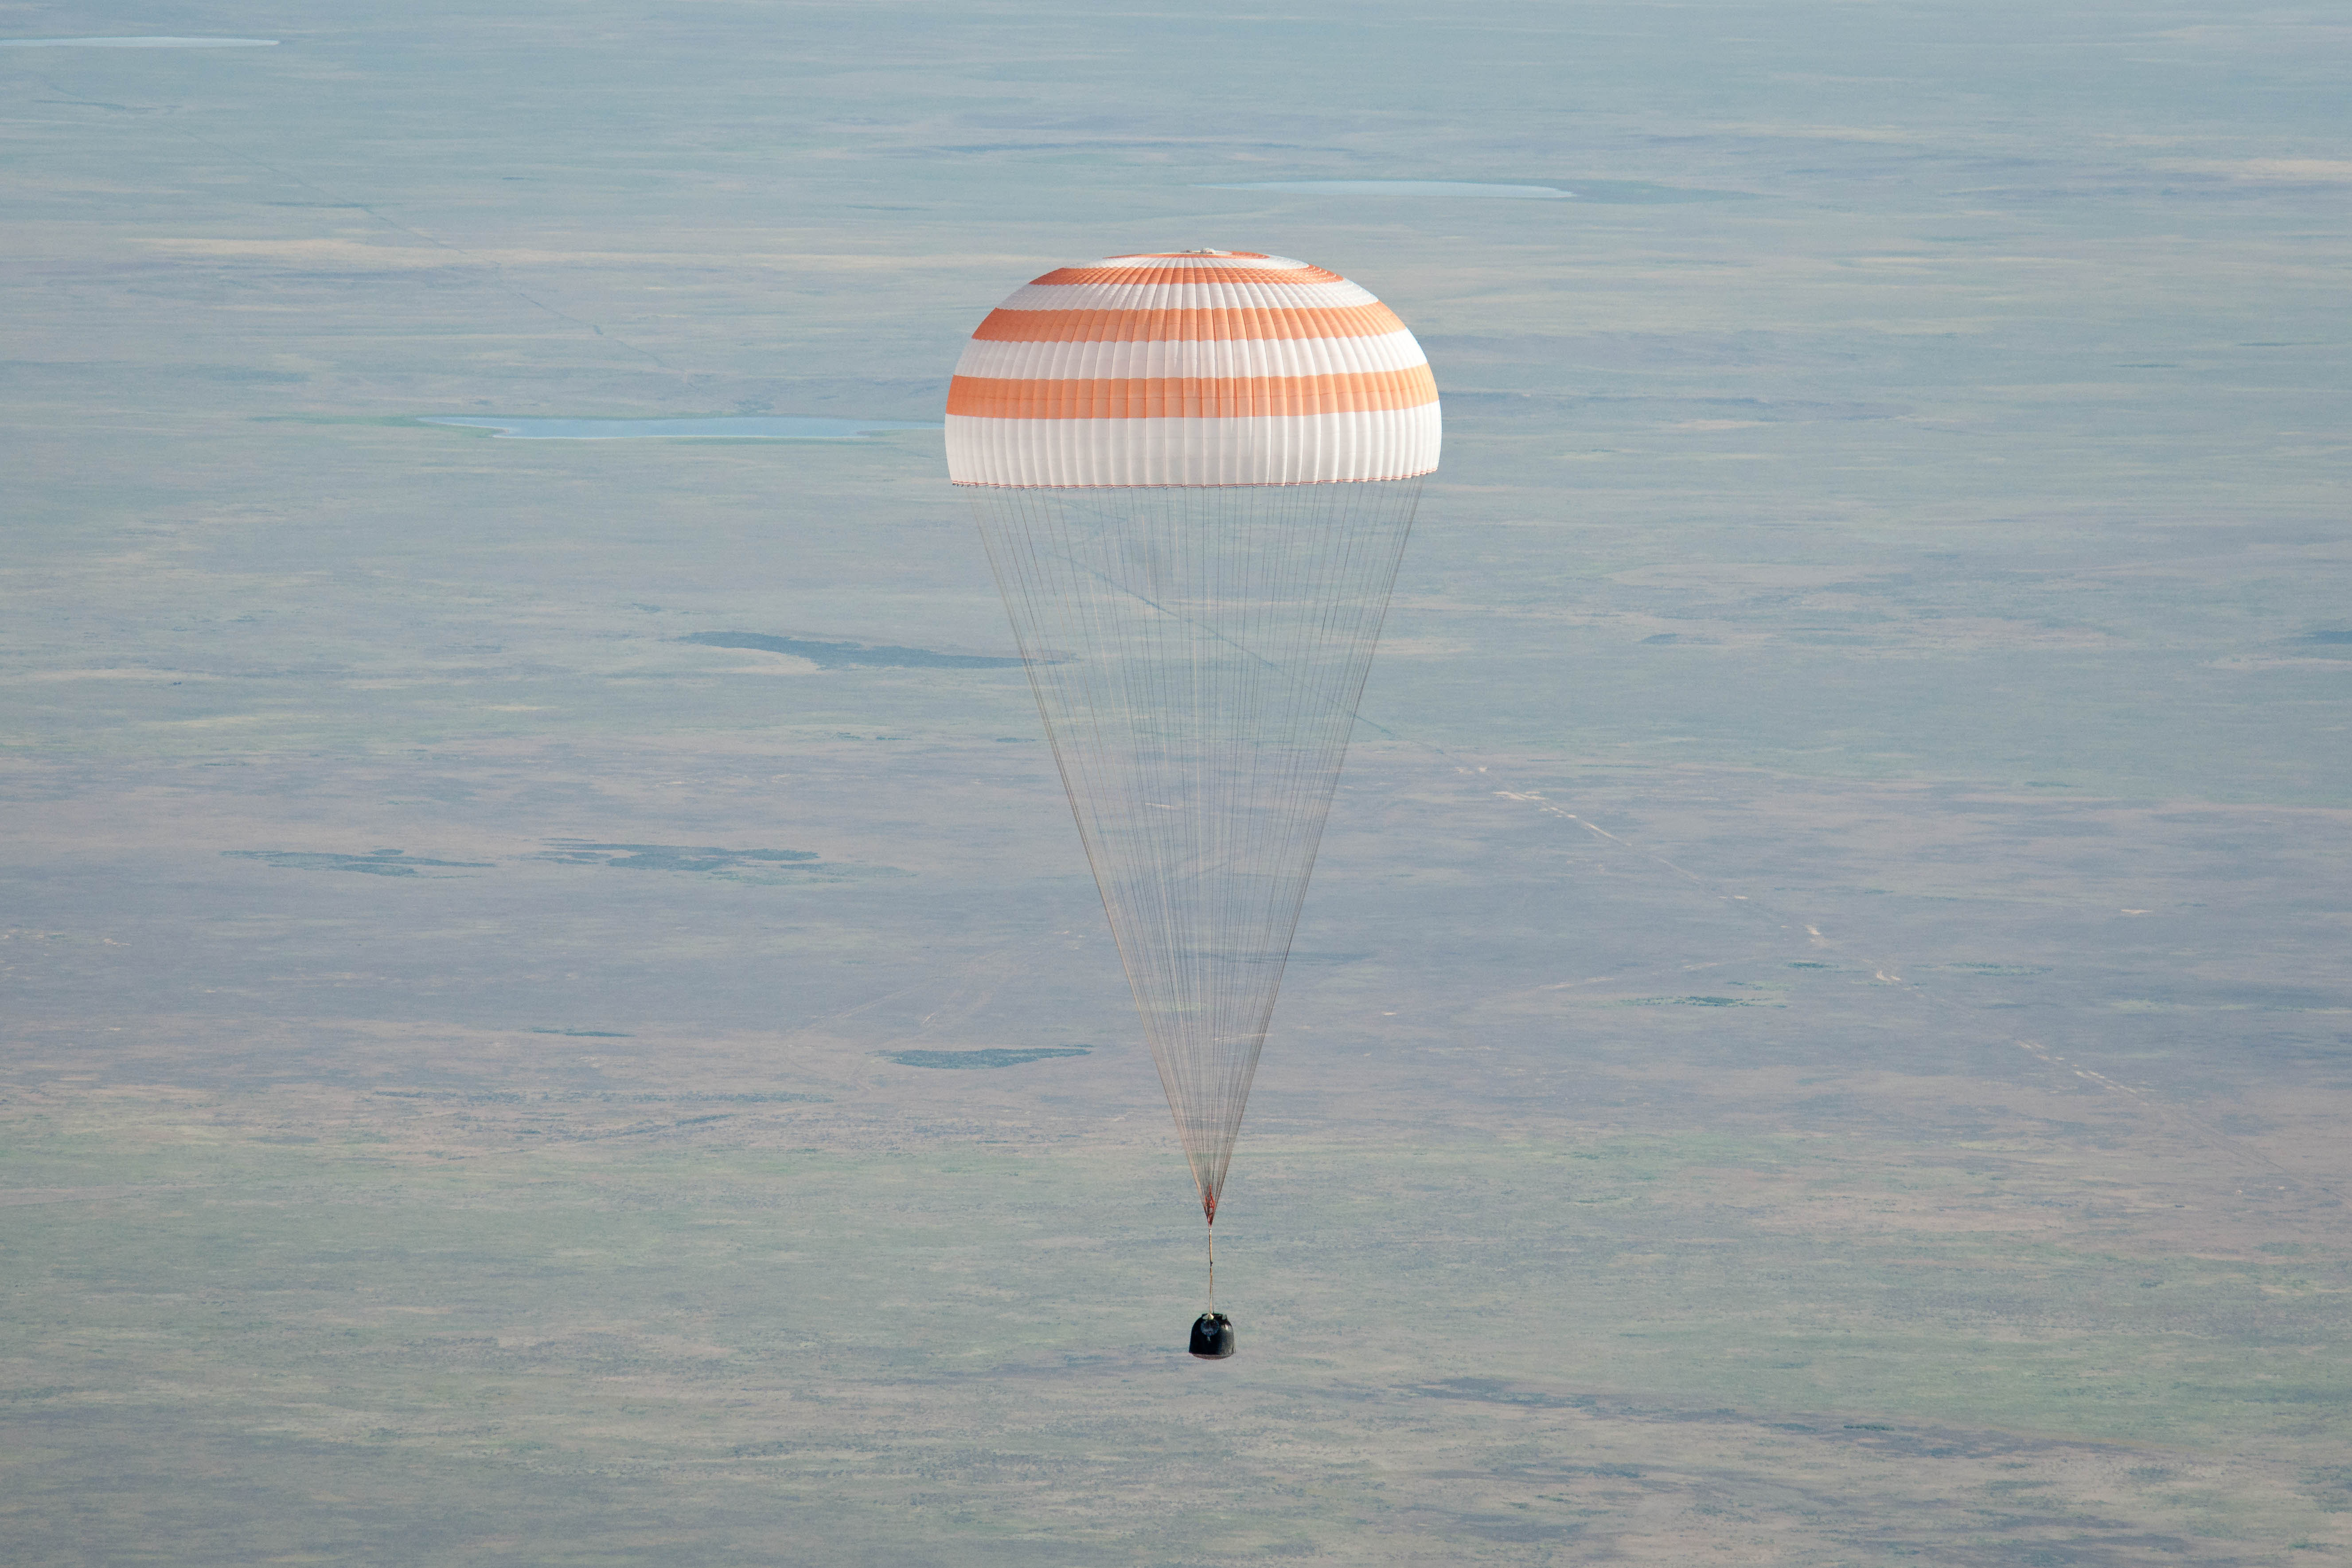 russian spacecraft landing - photo #22